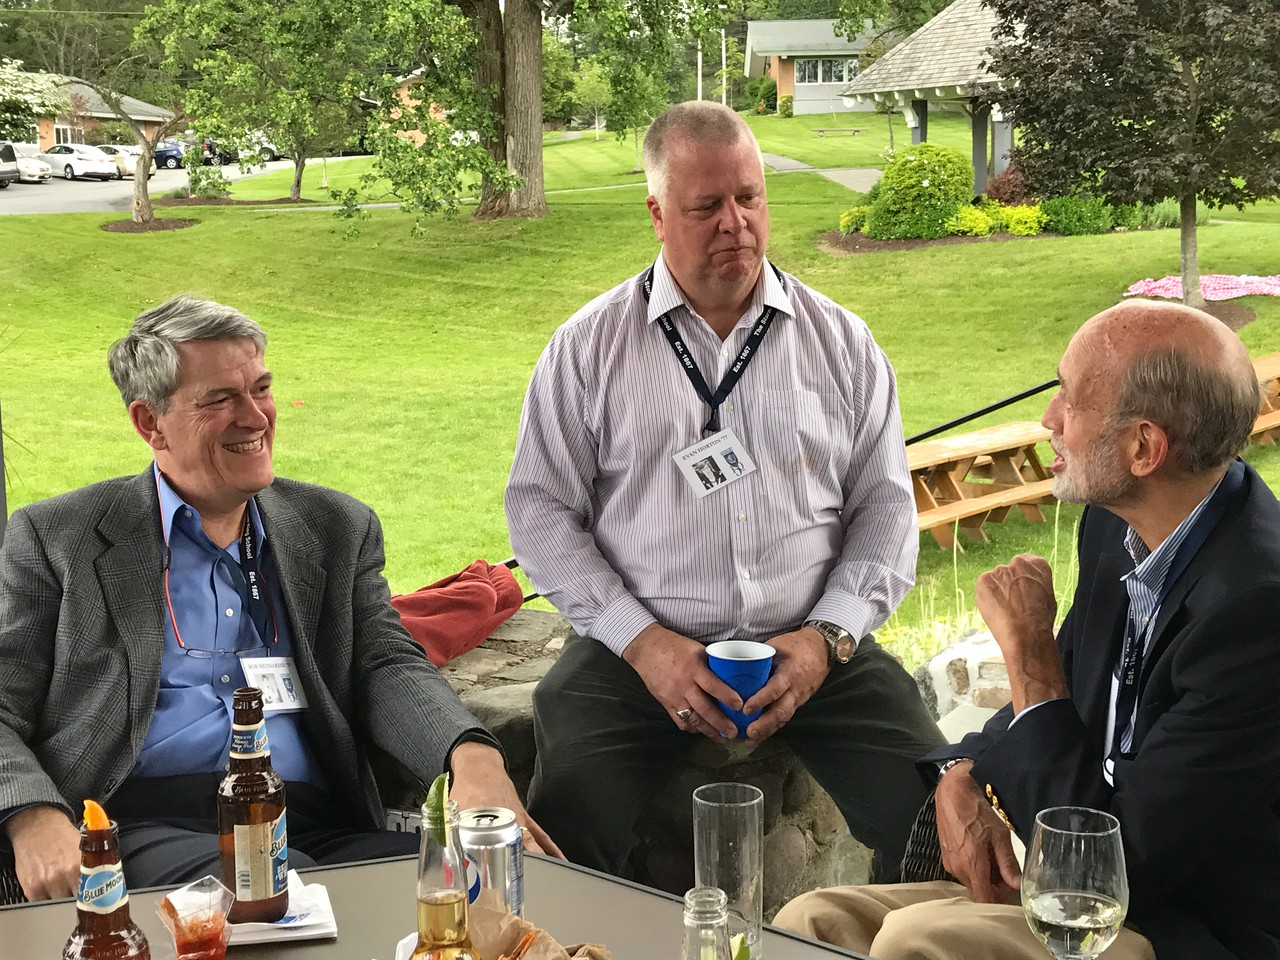 Bob Meynardie '77, Evan Horton '77 and Ned Farman, Past Faculty/Staff